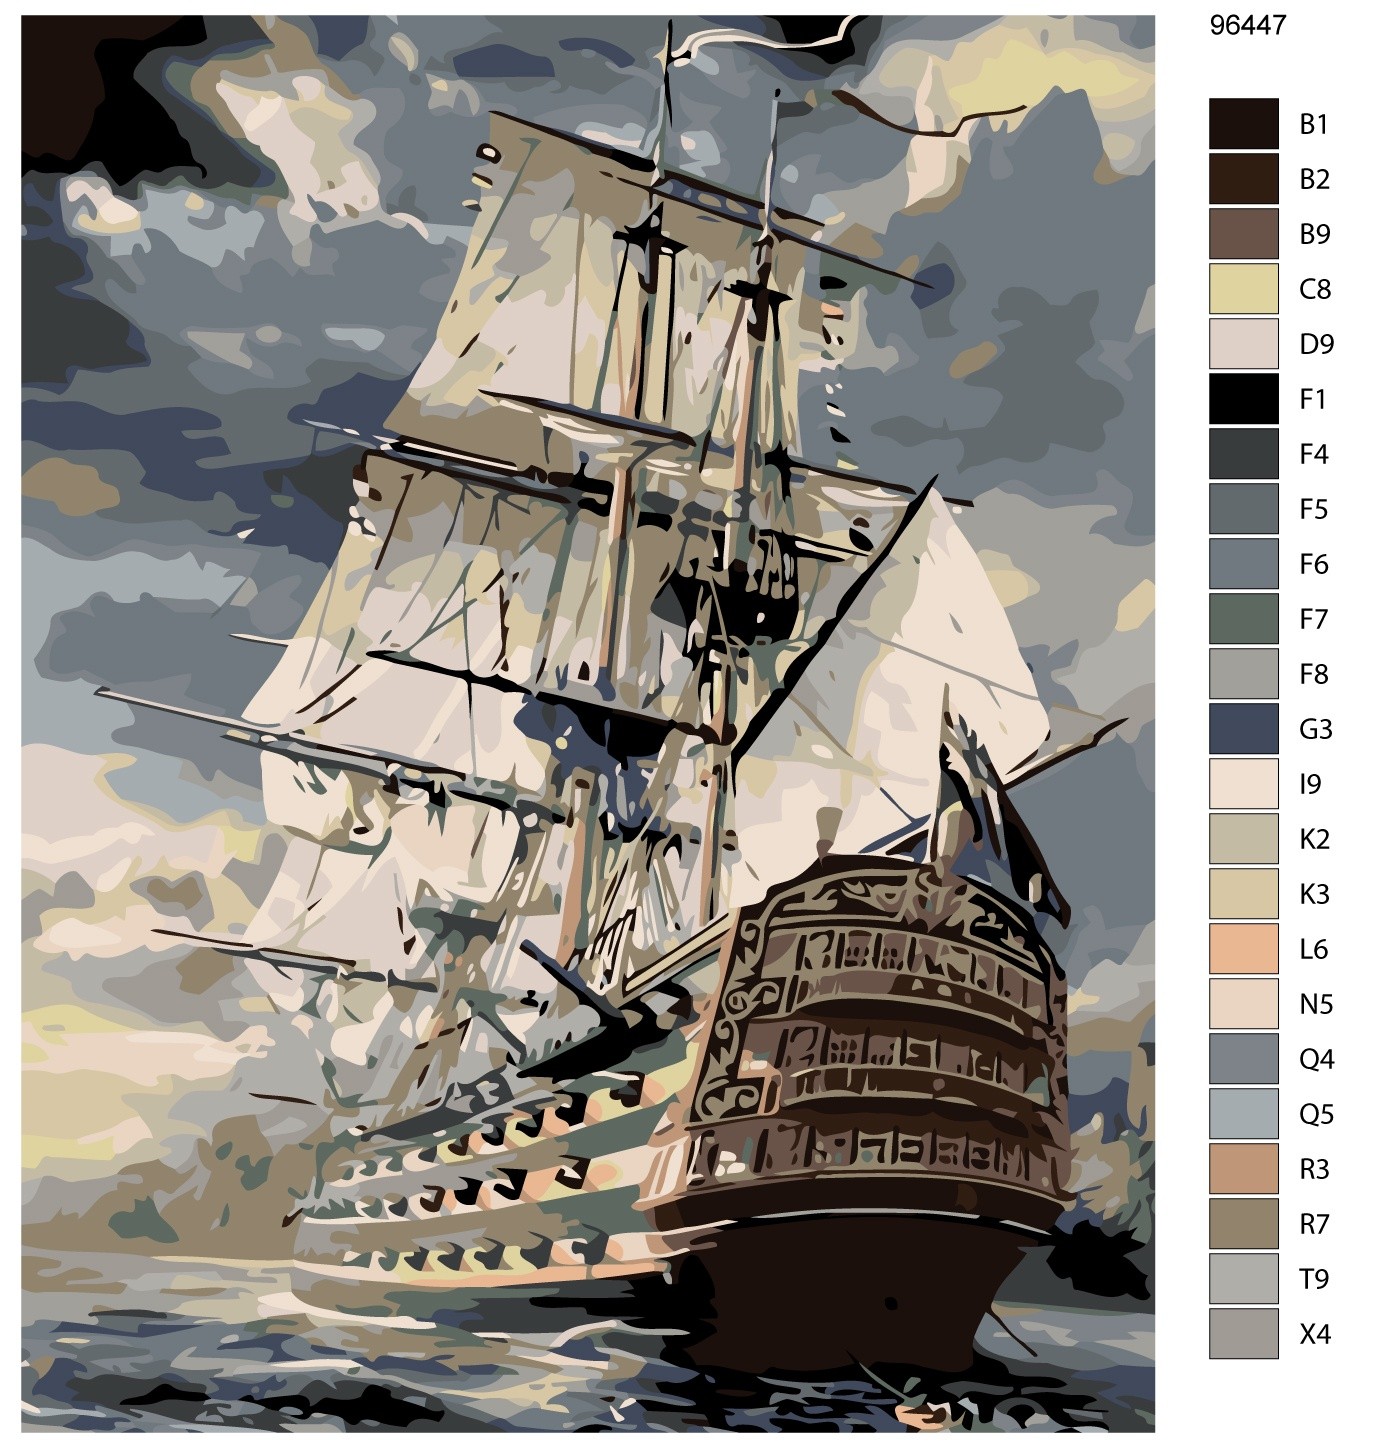 Картина по номерам, 80 x 100 см, KTMK-96447 поселягин владимир геннадьевич слово чести